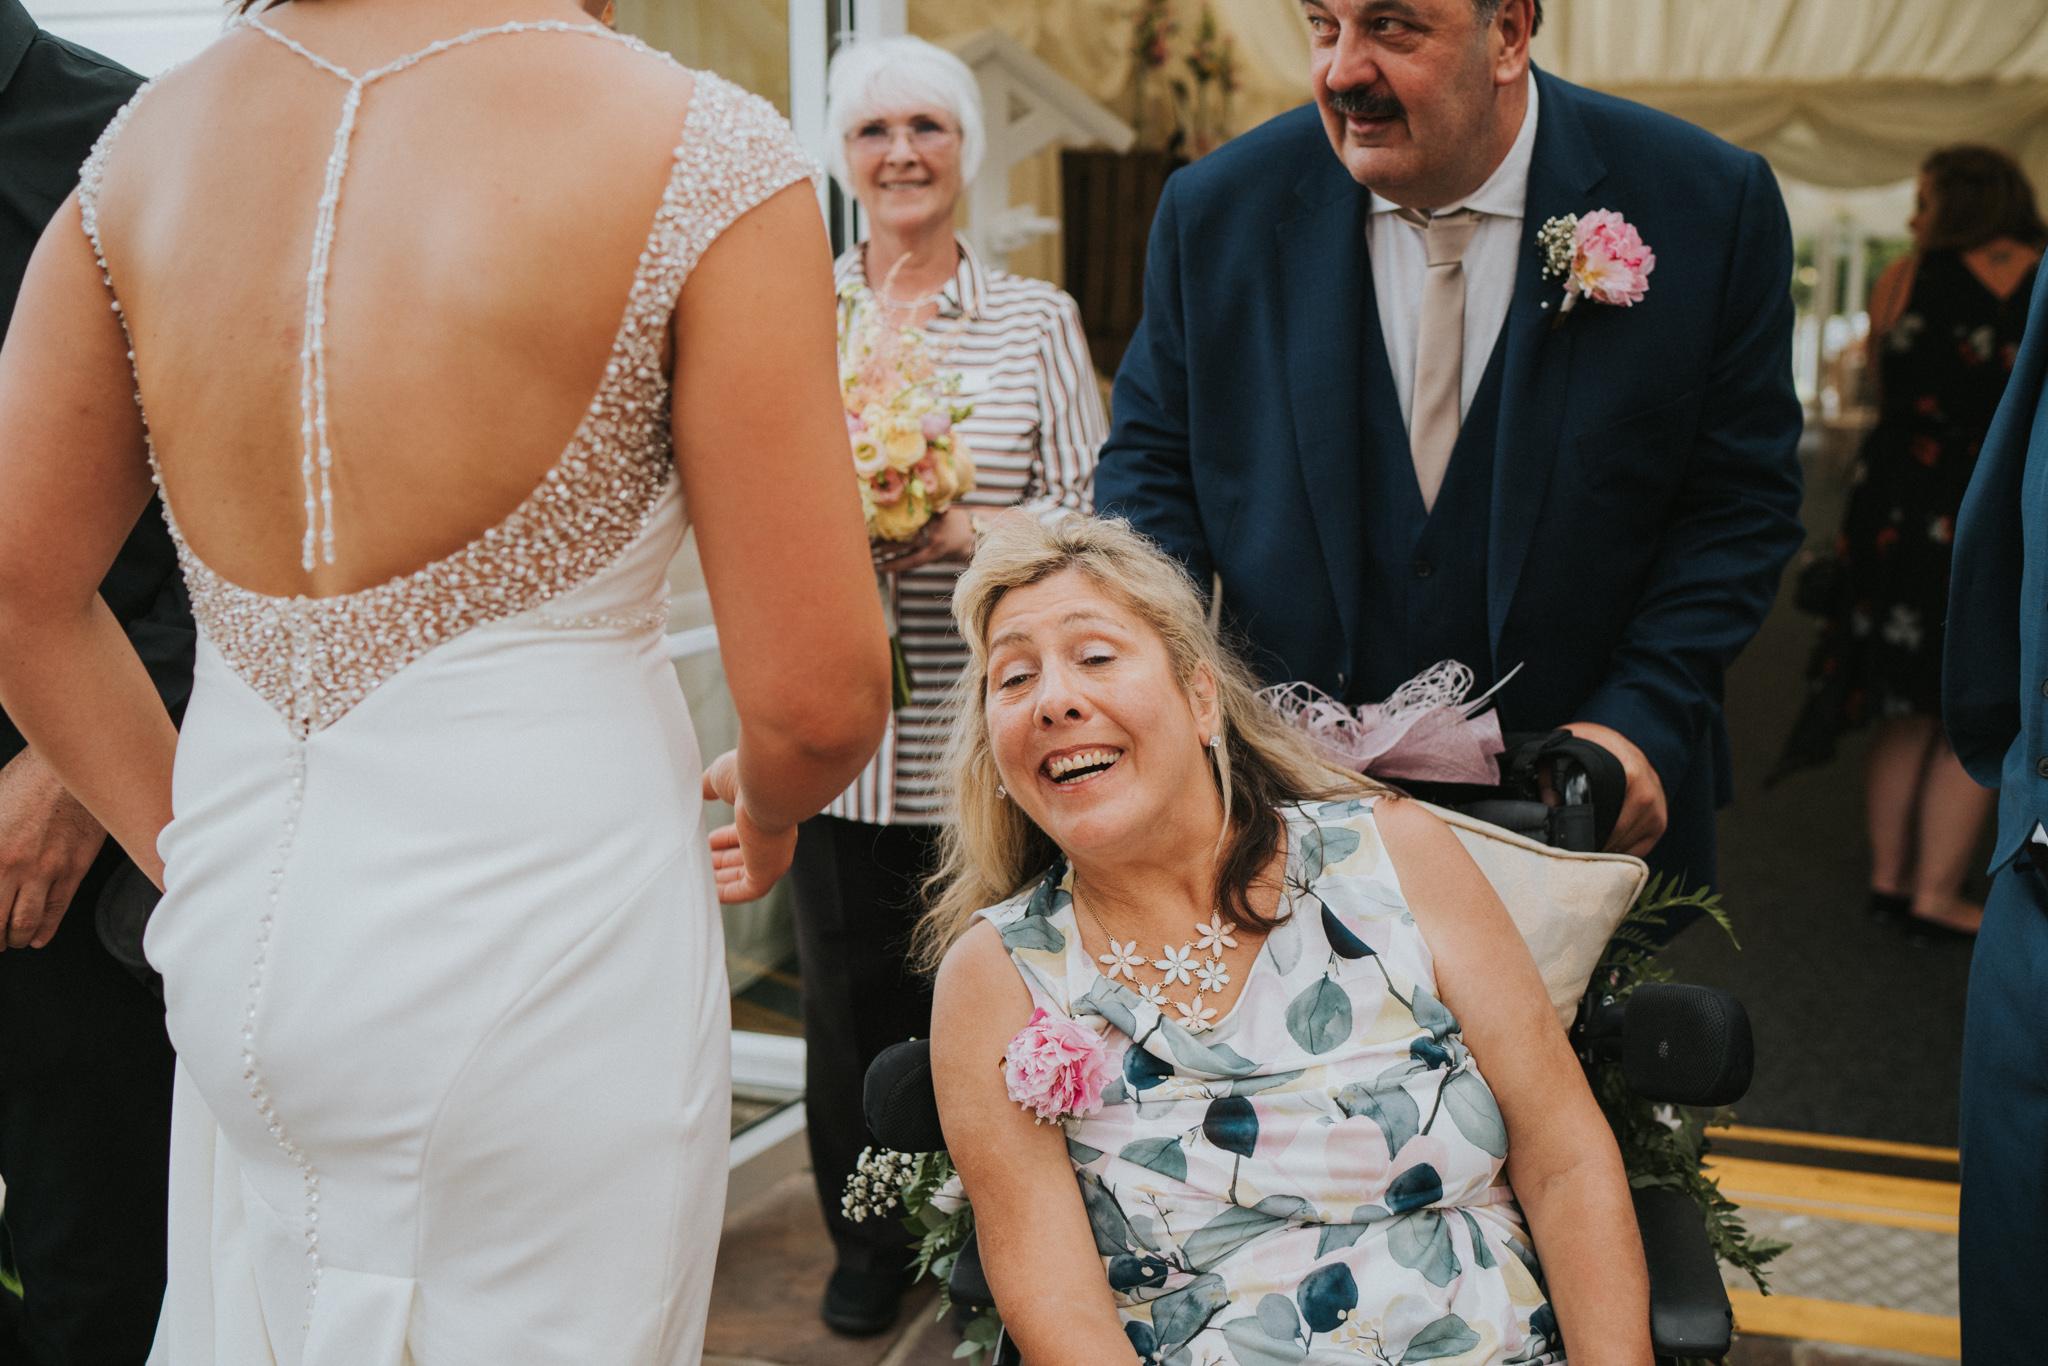 danielle-and-gareths-boho-wedding-previews-at-high-house-weddings-grace-elizabeth-colchester-essex-suffolk-norfolk-devon-alternative-wedding-and-lifestyle-photographer (68 of 76).jpg